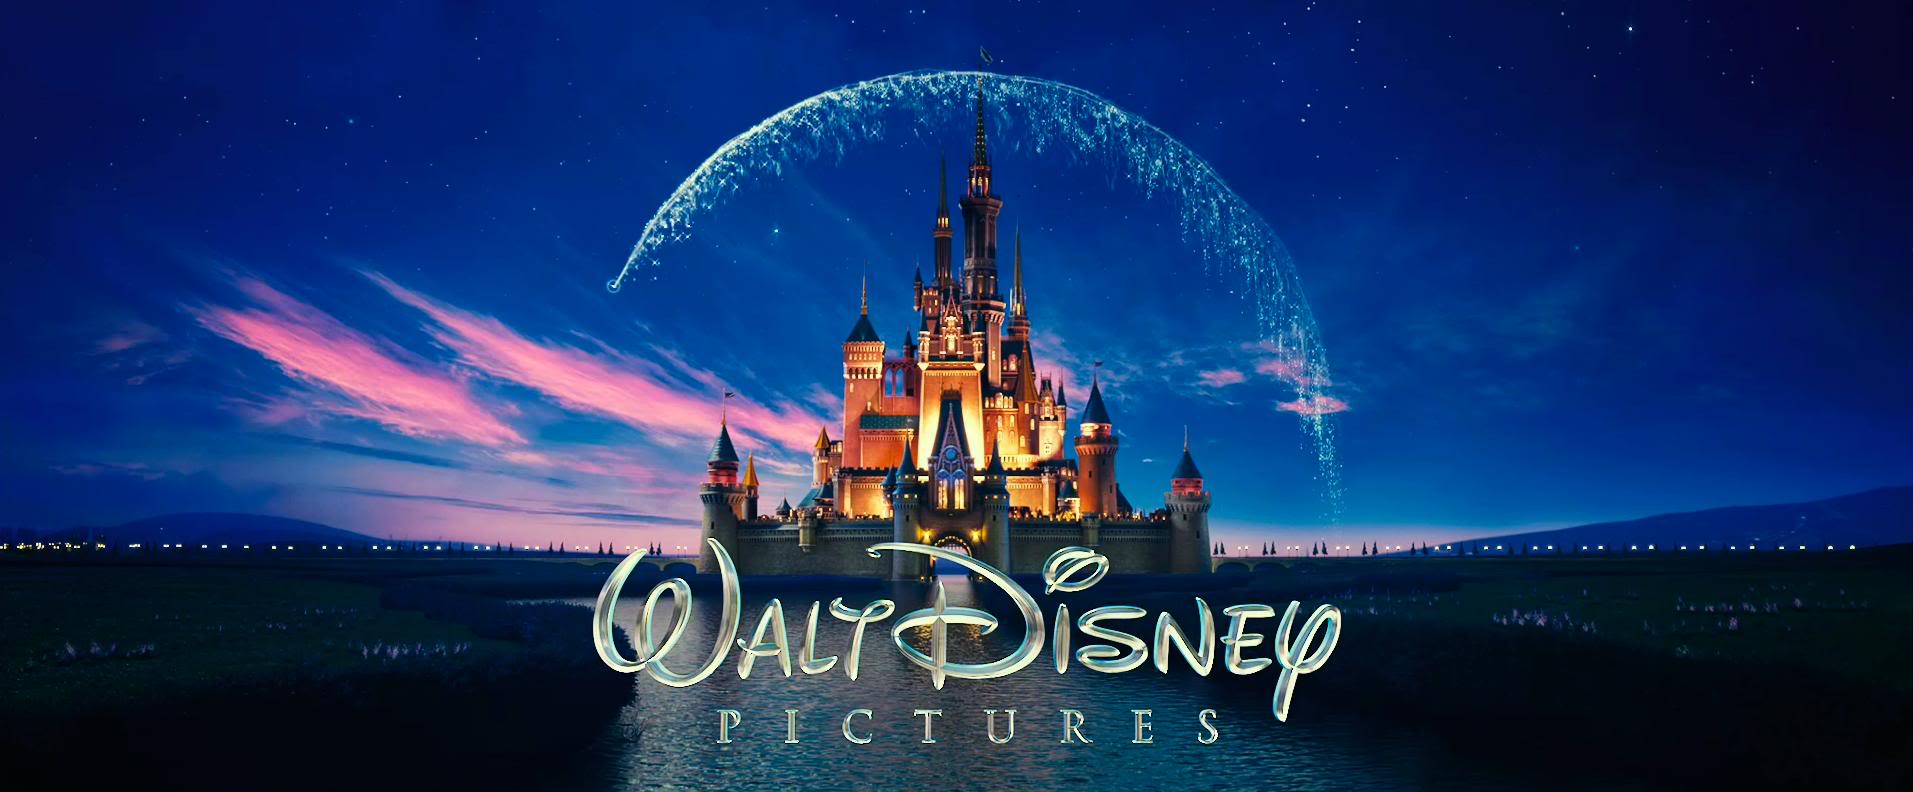 Disney Logo Walt Disneyjpg 1913x792